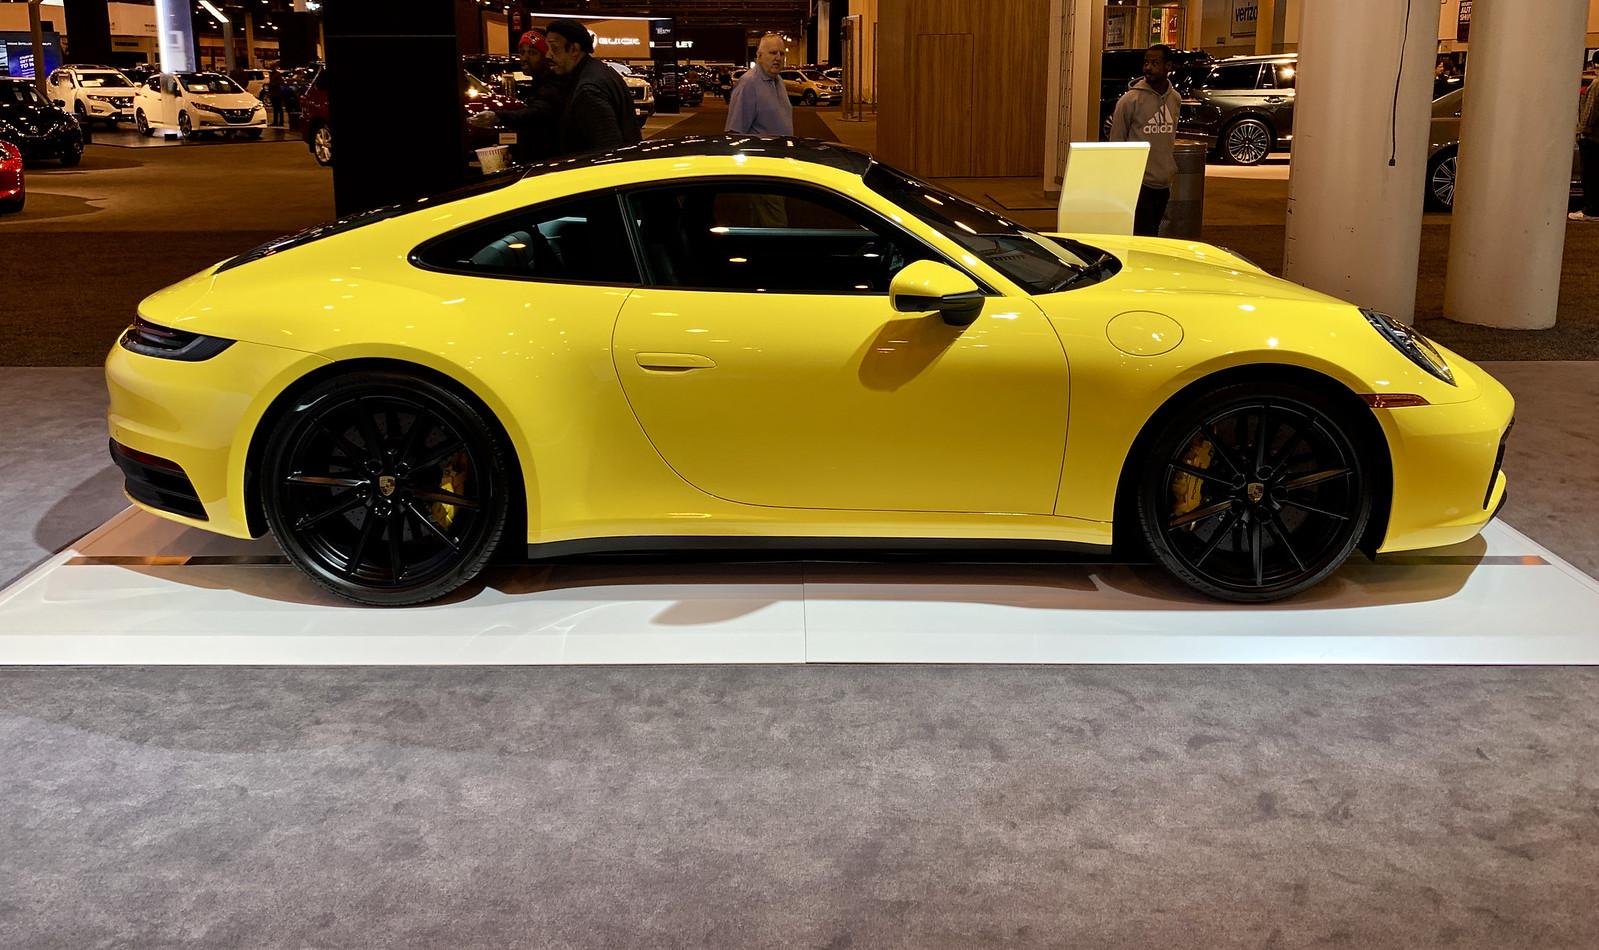 Machinery 2019 Houston Auto Show - Porsche 911